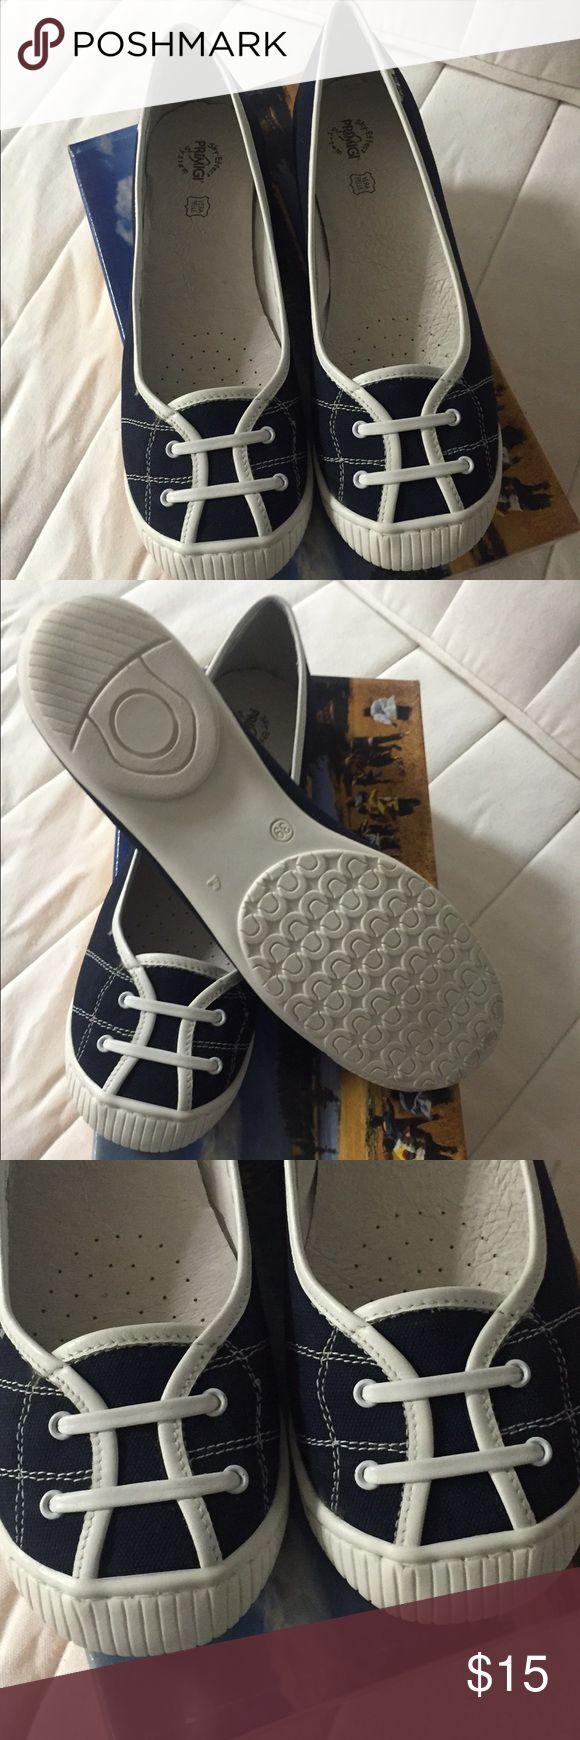 Black flat shoes by Primigi Very comfortable black flat shoes. New in a box Primigi Shoes Flats & Loafers